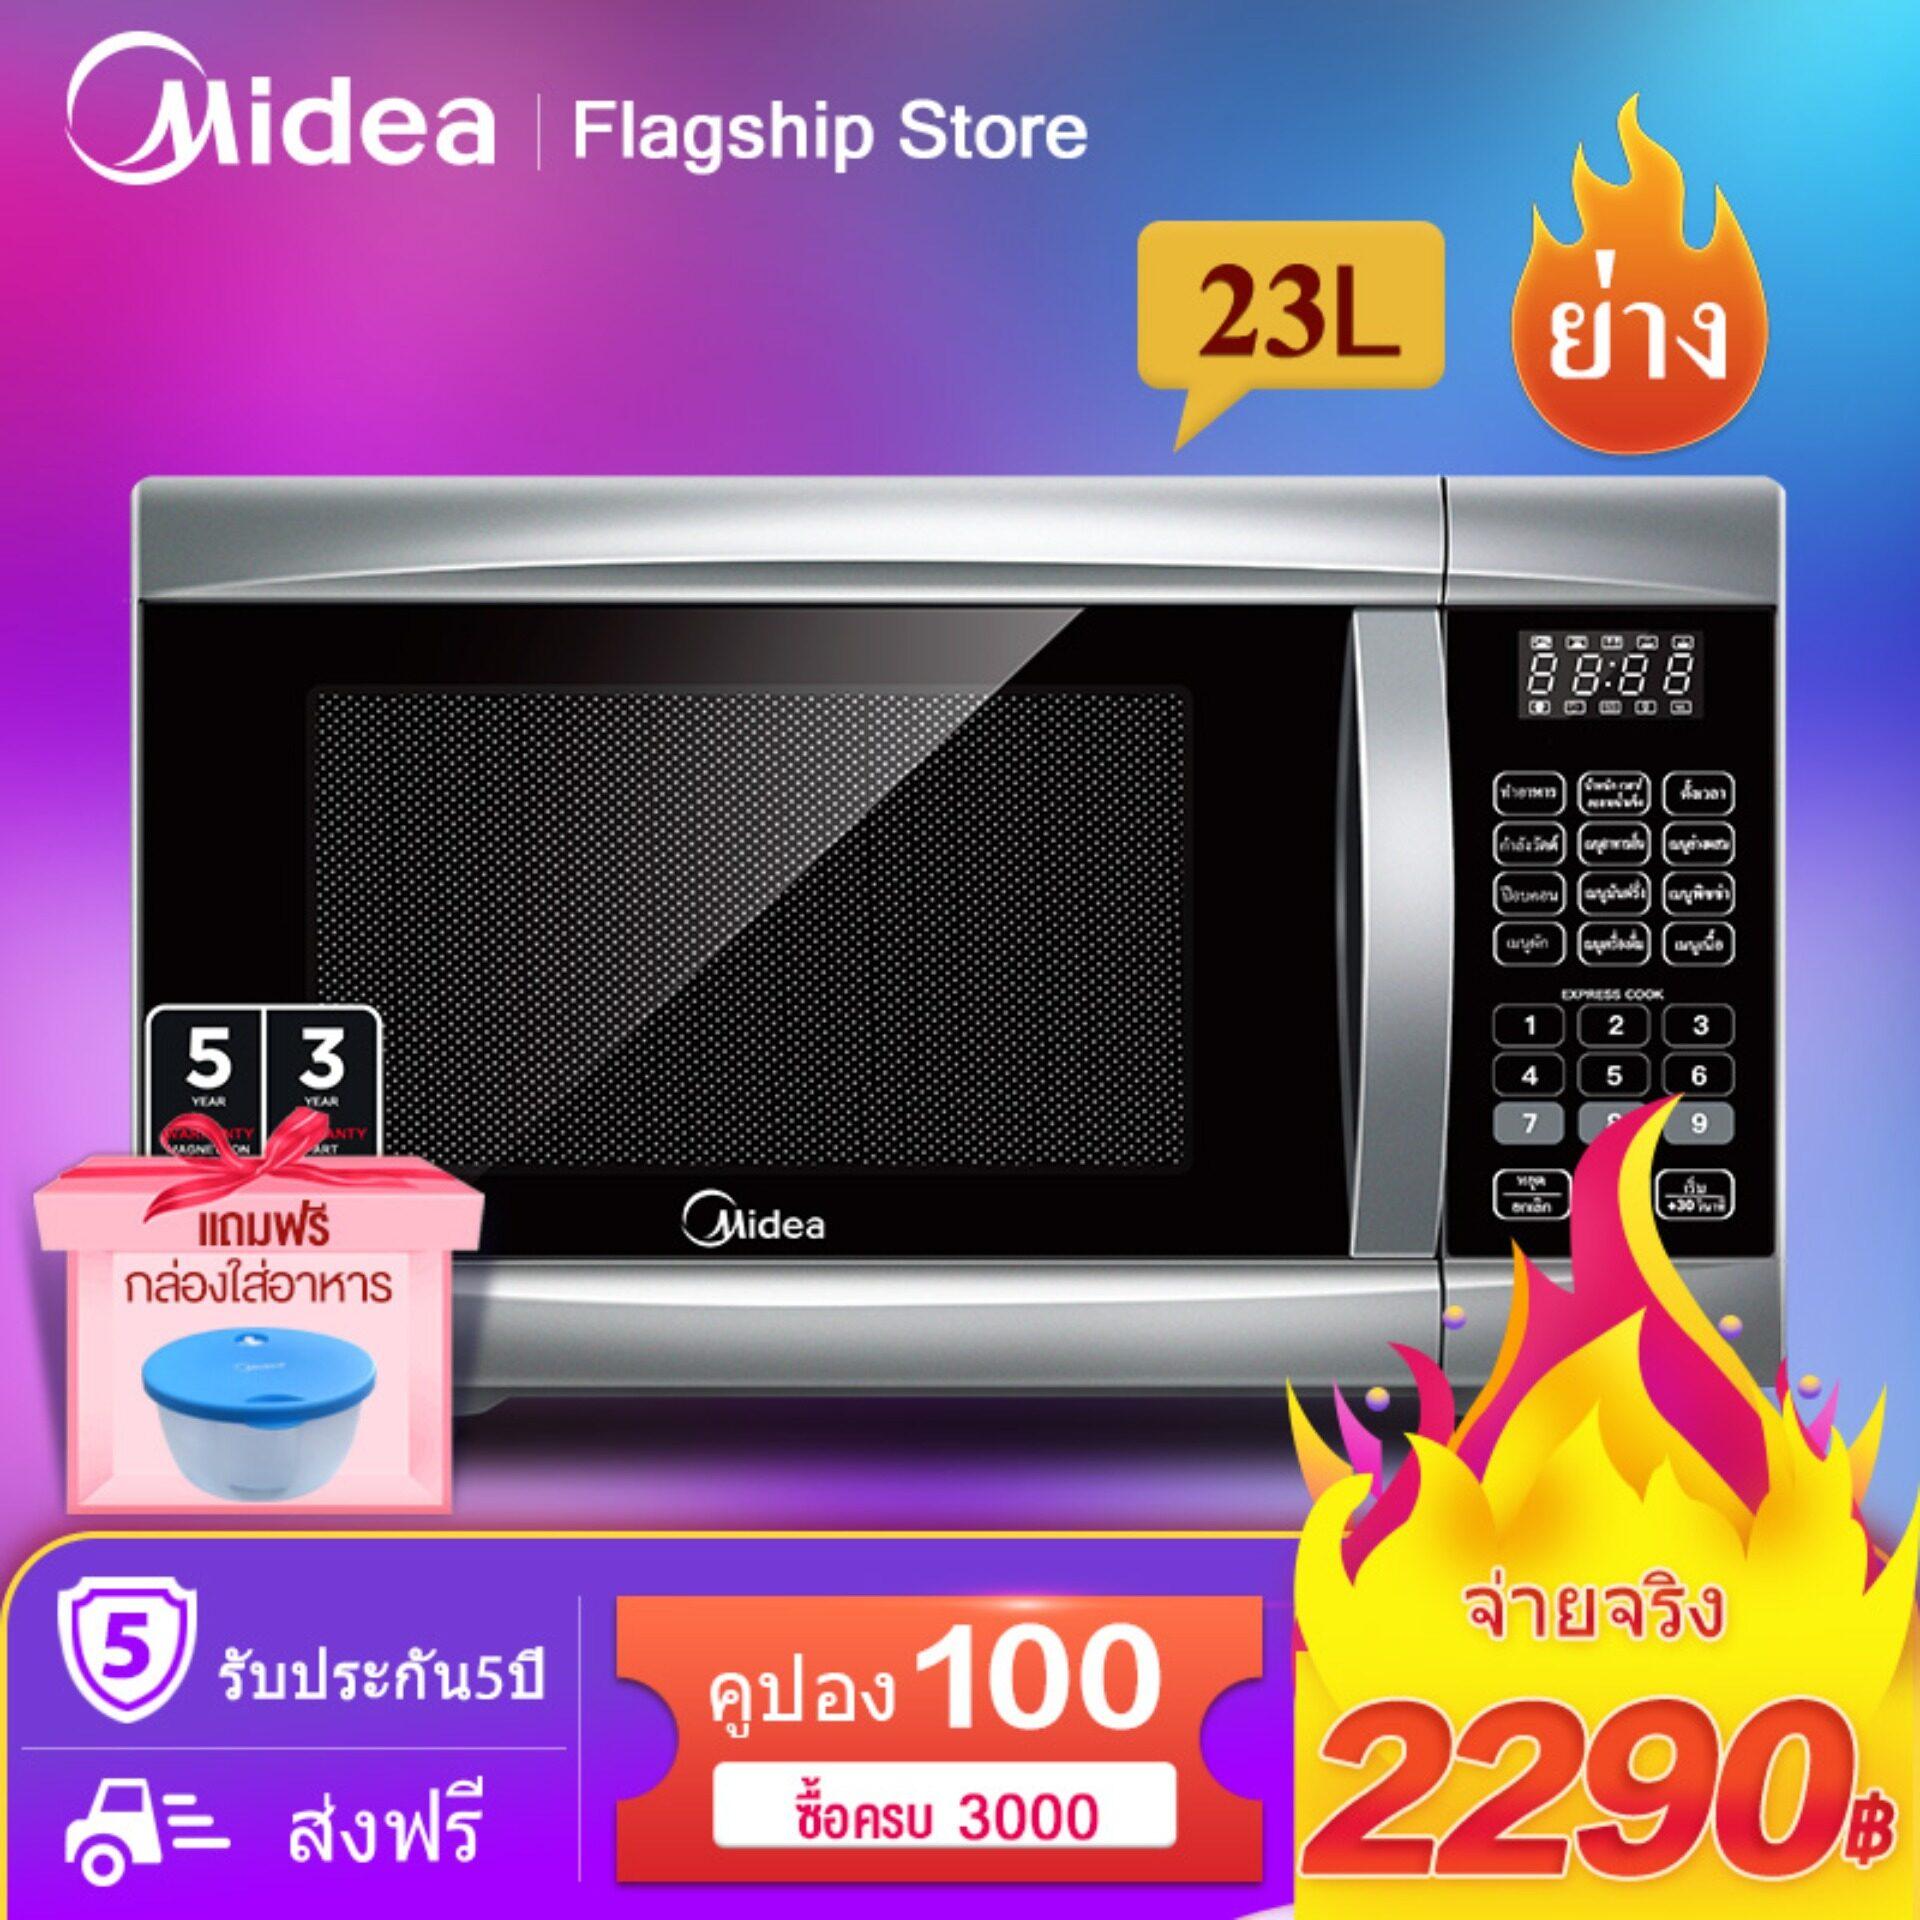 Midea Microwave Oven มีเดียไมโครเวฟ, ฟังก์ชั่นย่าง, ฟังก์ชั่น Quick Cook 30นาที, ความจุ 23 ลิตร, รุ่น MMO-237GDS (สีเทา)